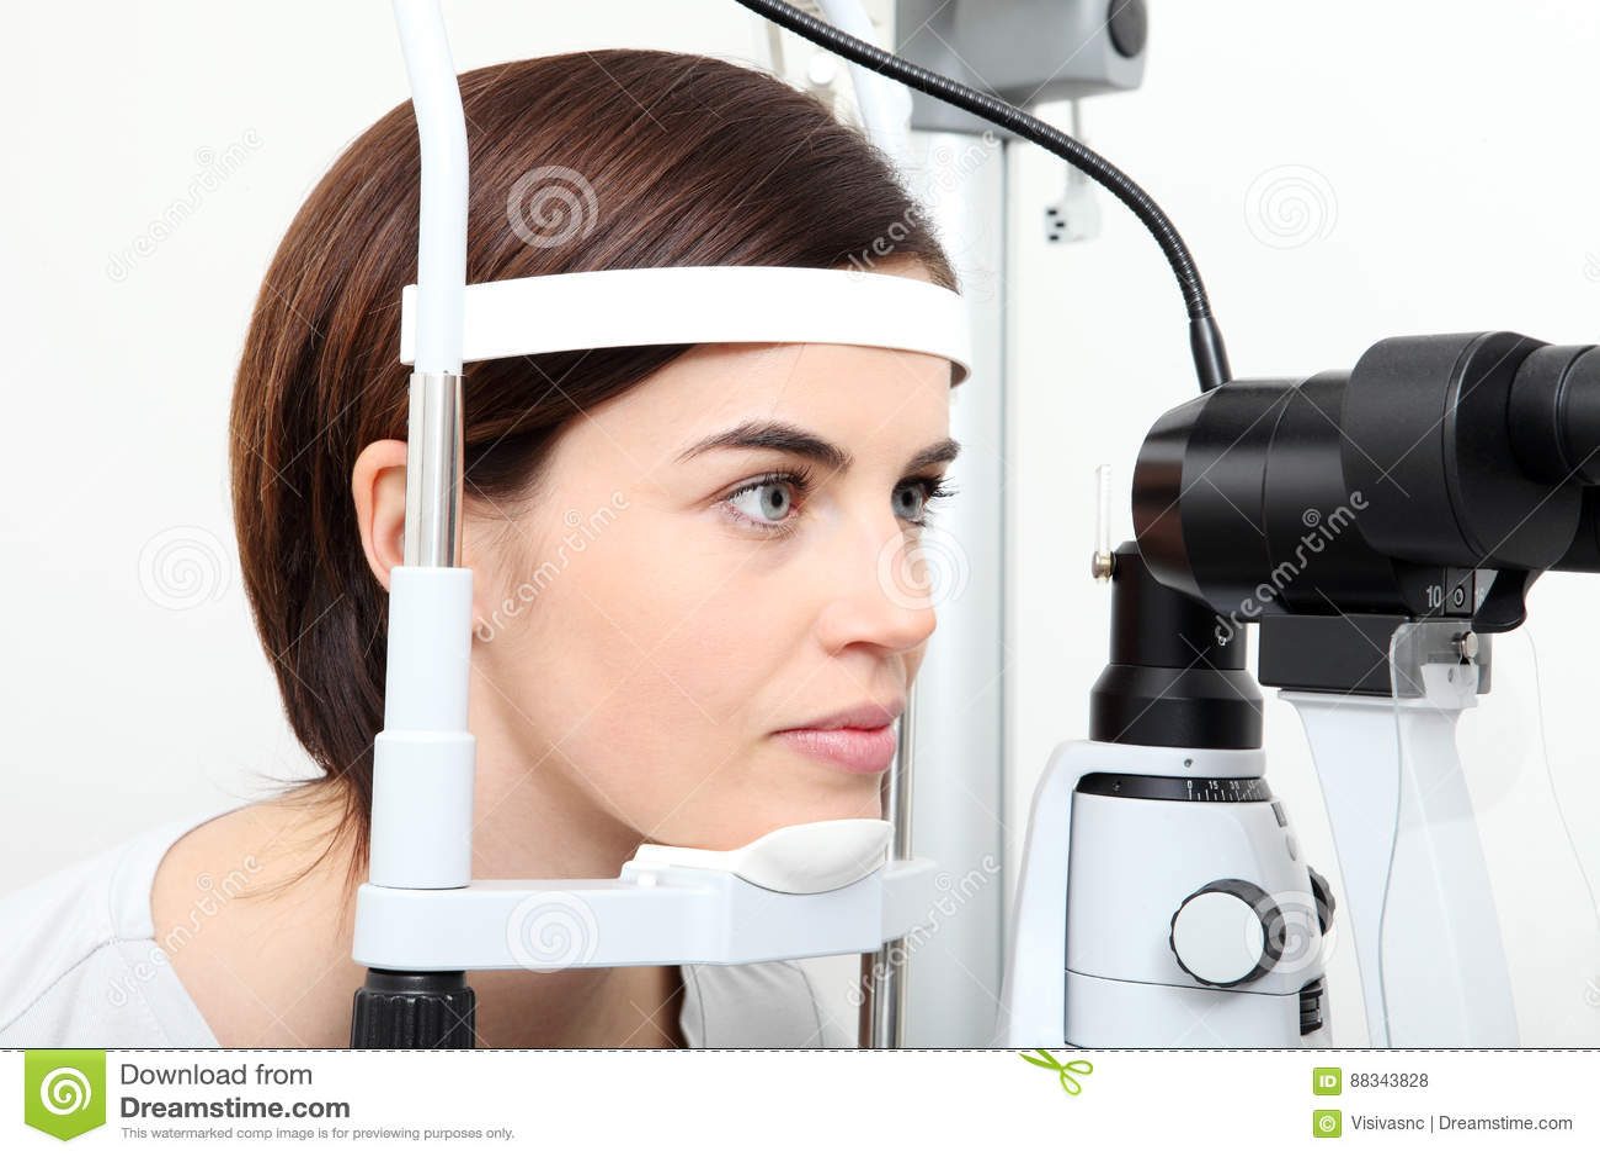 20c8c52574 Download Γυναίκα που κάνει τη μέτρηση όρασης με τον οπτικό λαμπτήρα σχισμών  Στοκ Εικόνες - εικόνα